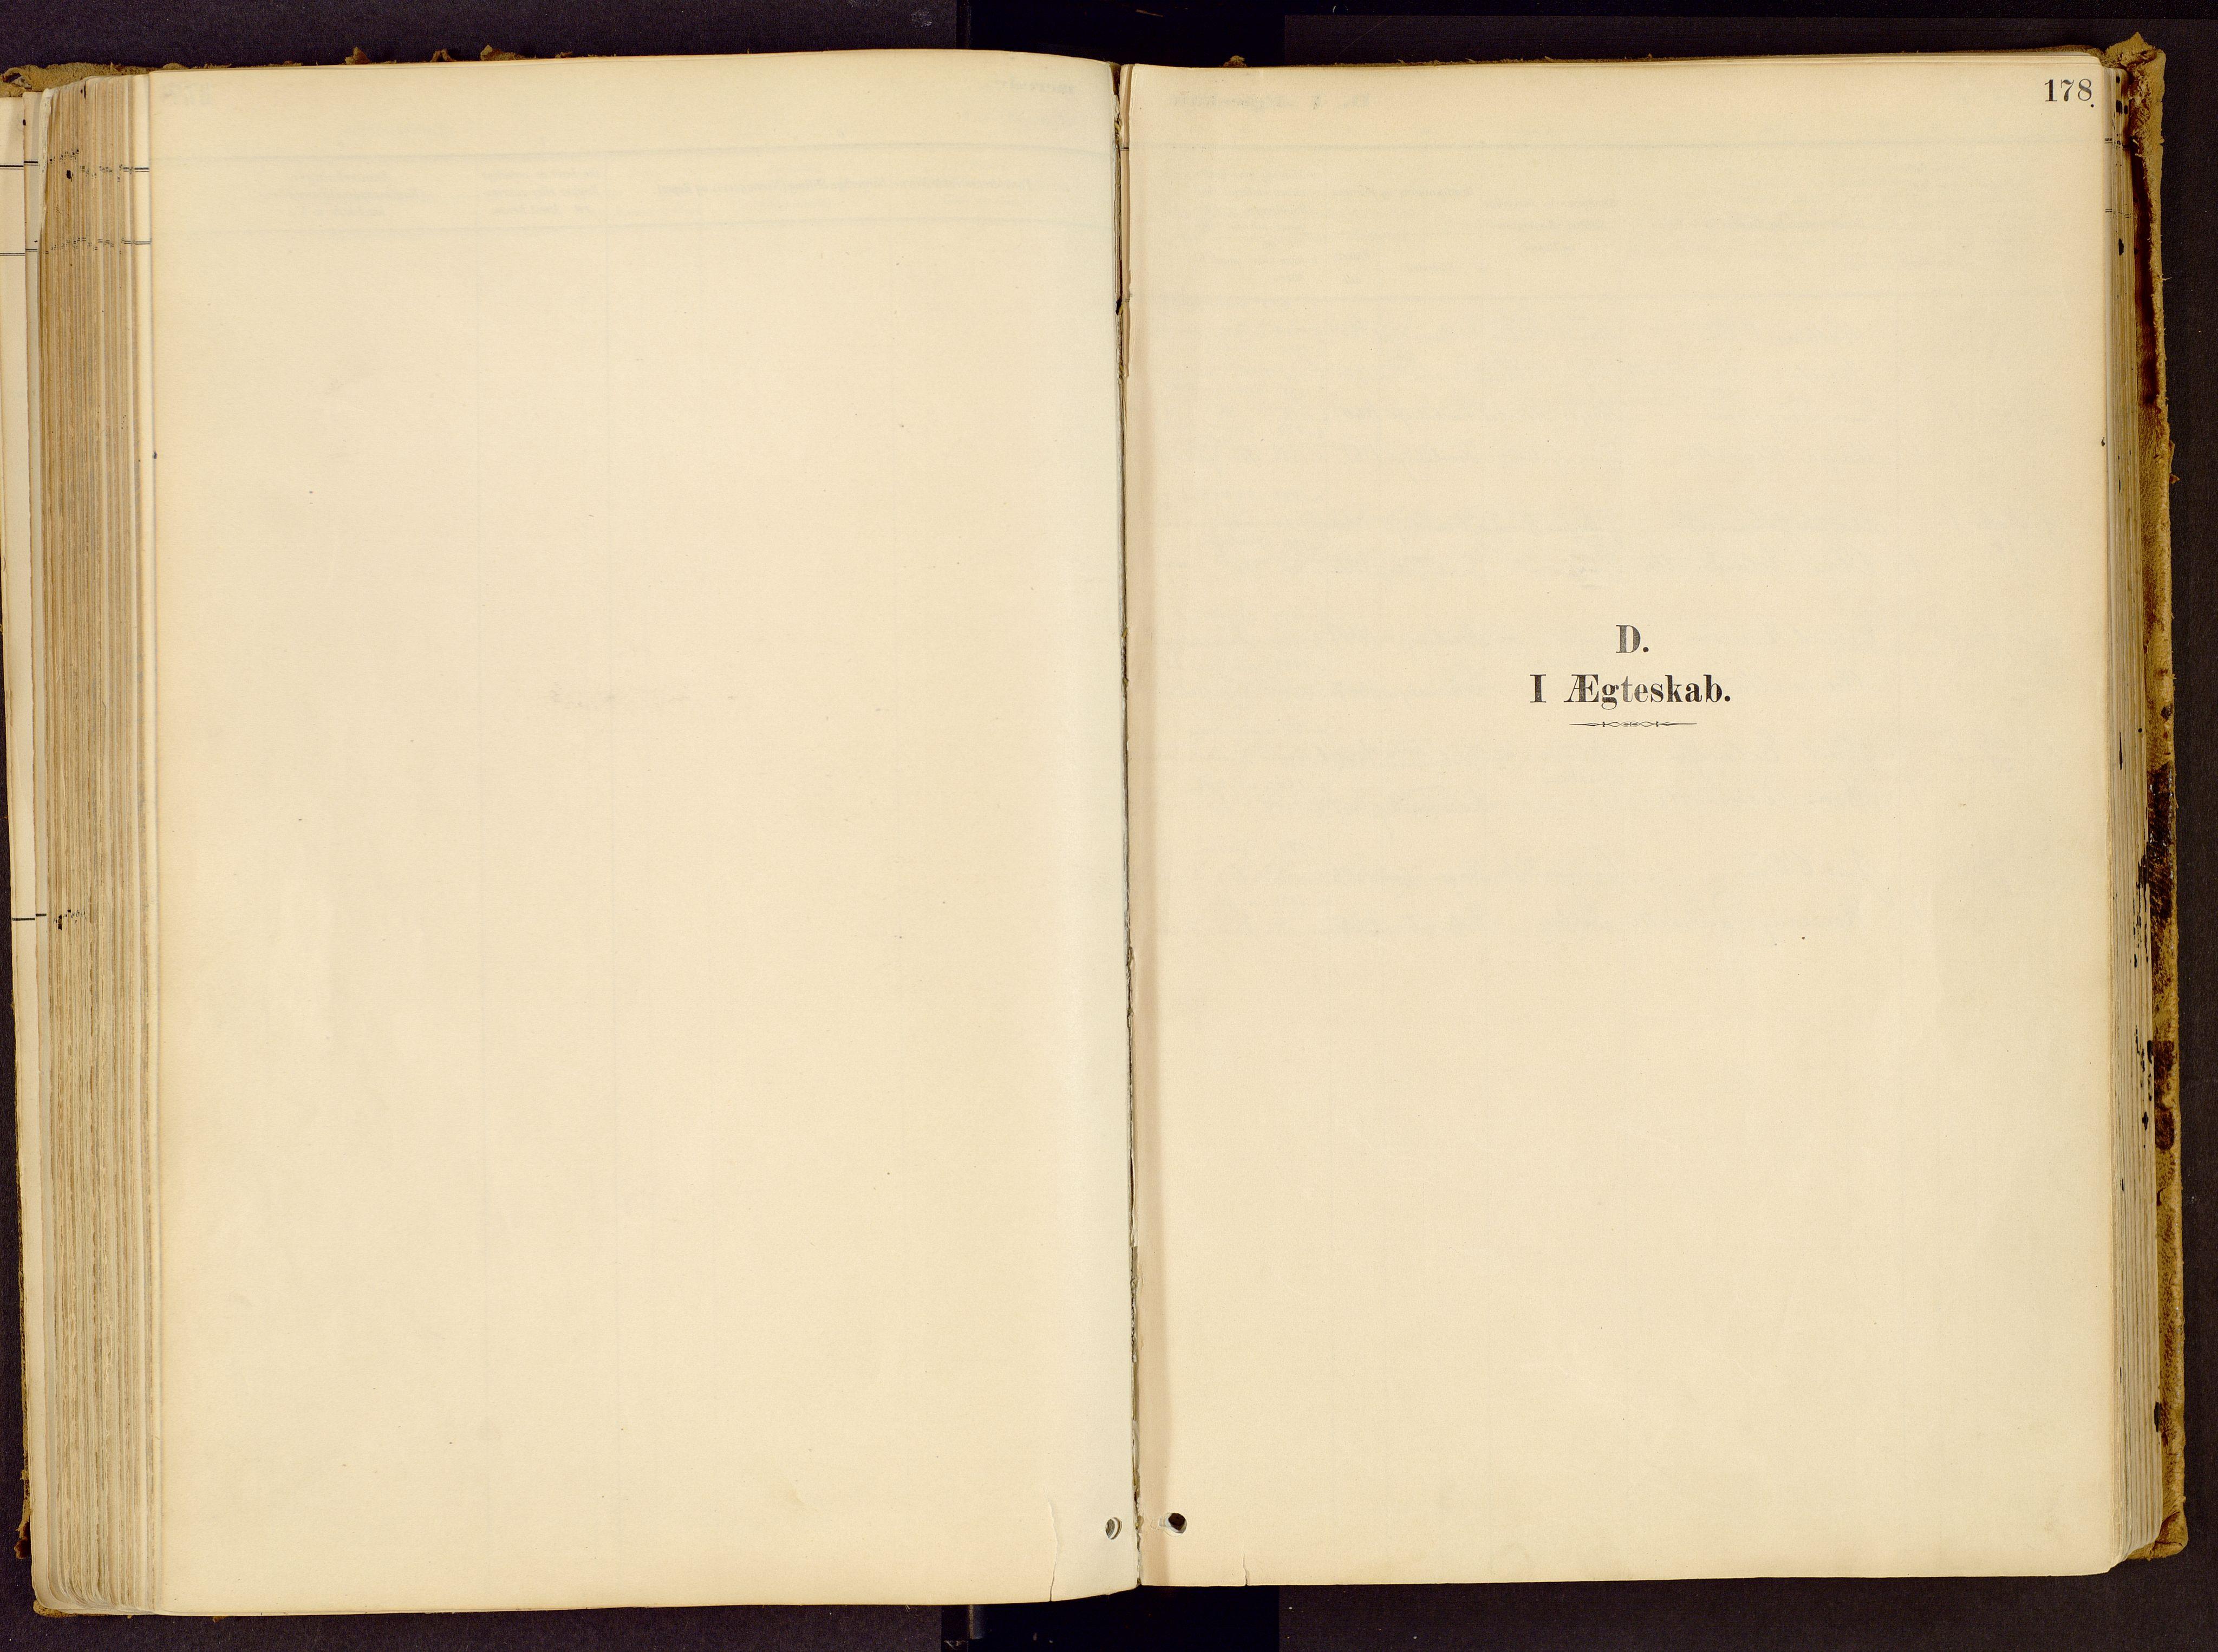 SAH, Vestre Gausdal prestekontor, Ministerialbok nr. 1, 1887-1914, s. 178